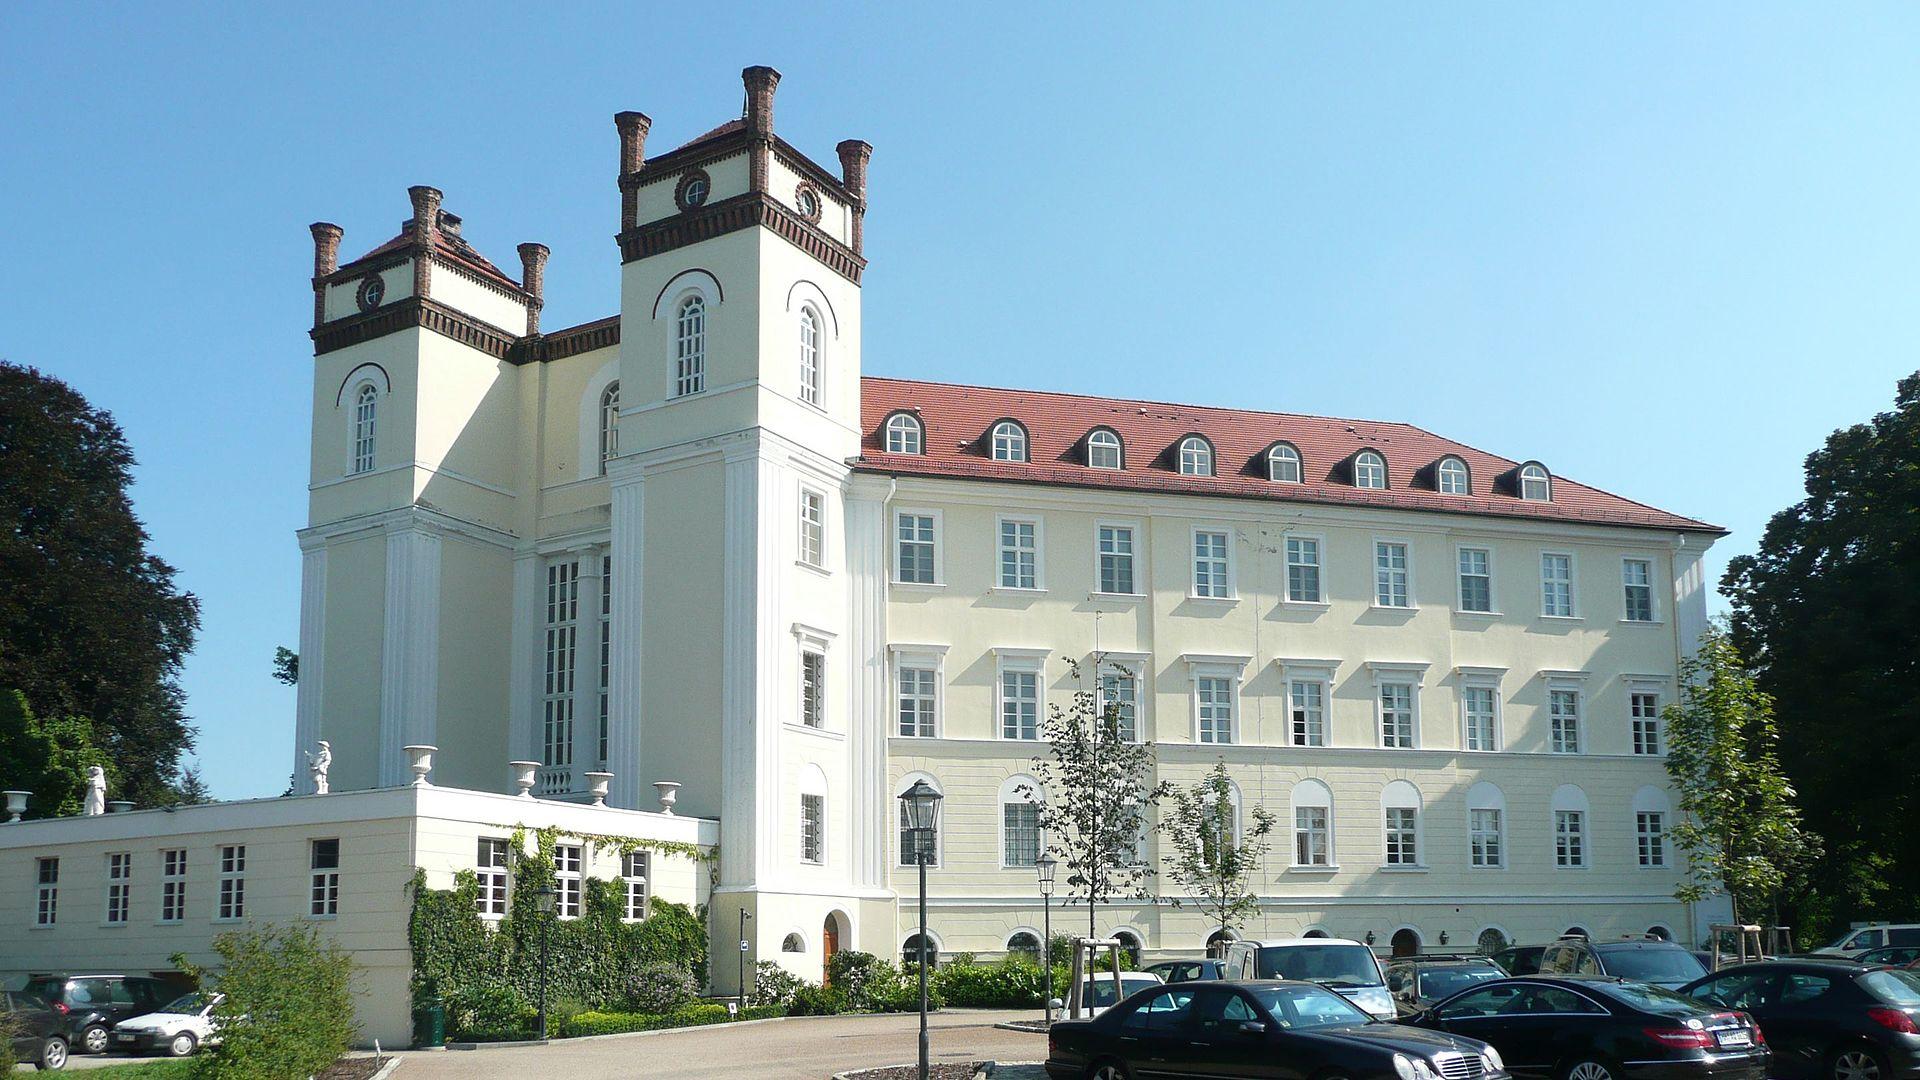 Bild Schloss Lübbenau